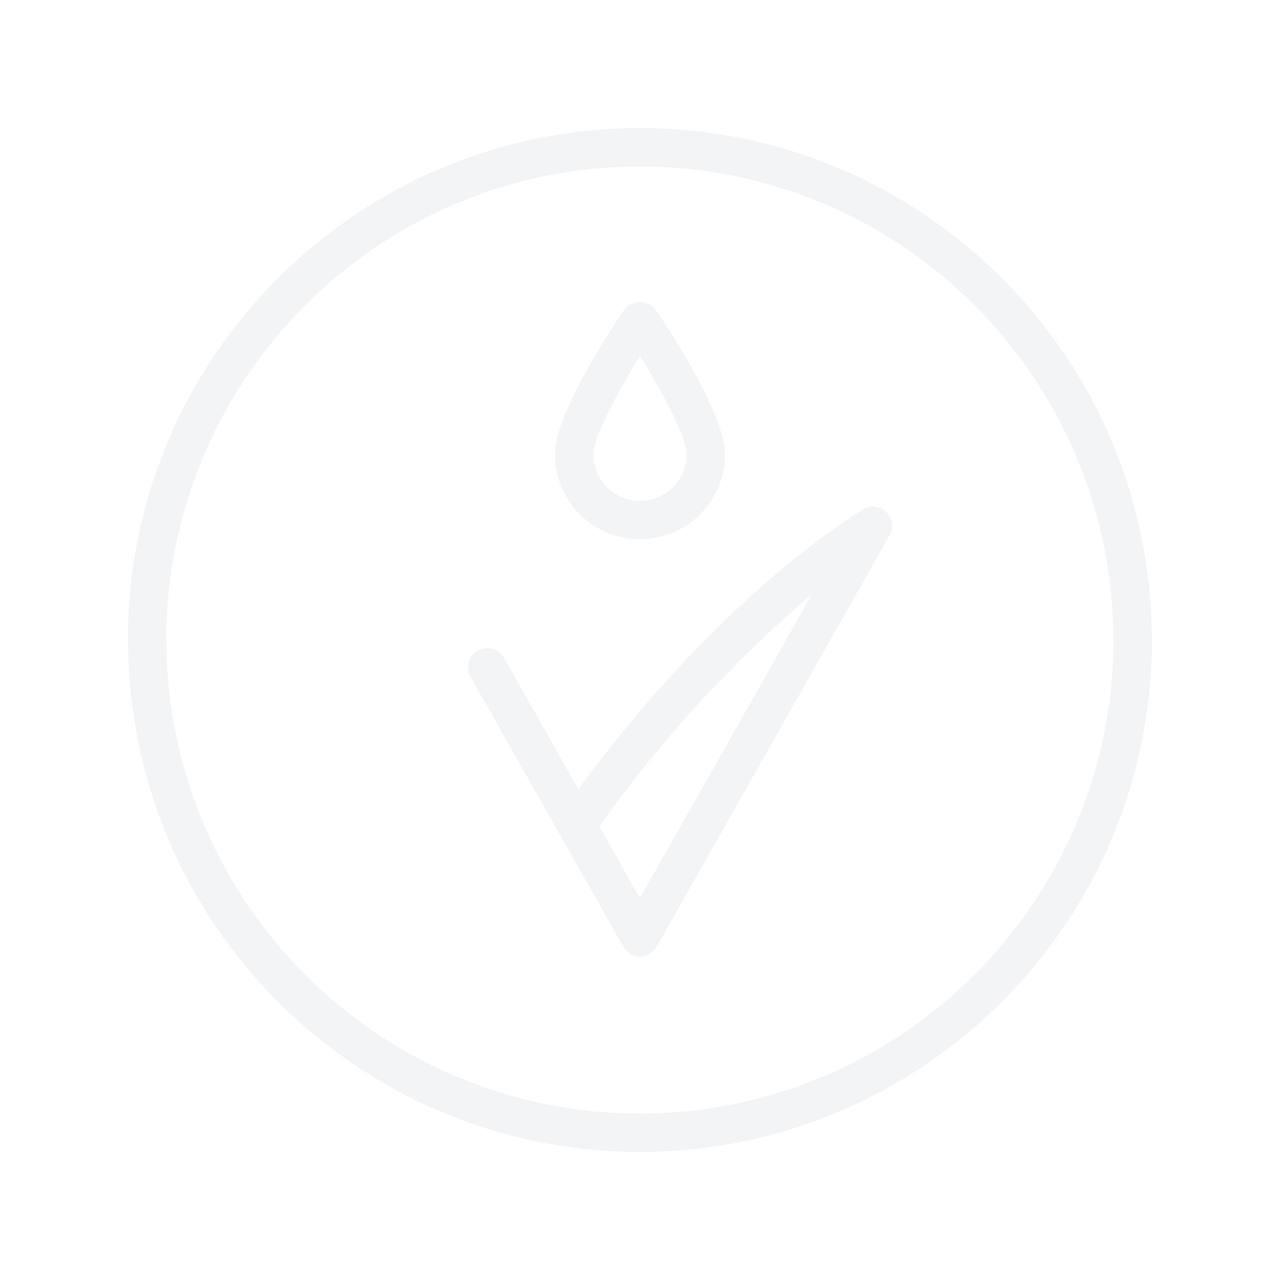 JANE IREDALE PurePressed Duo Eyeshadow 2.8g